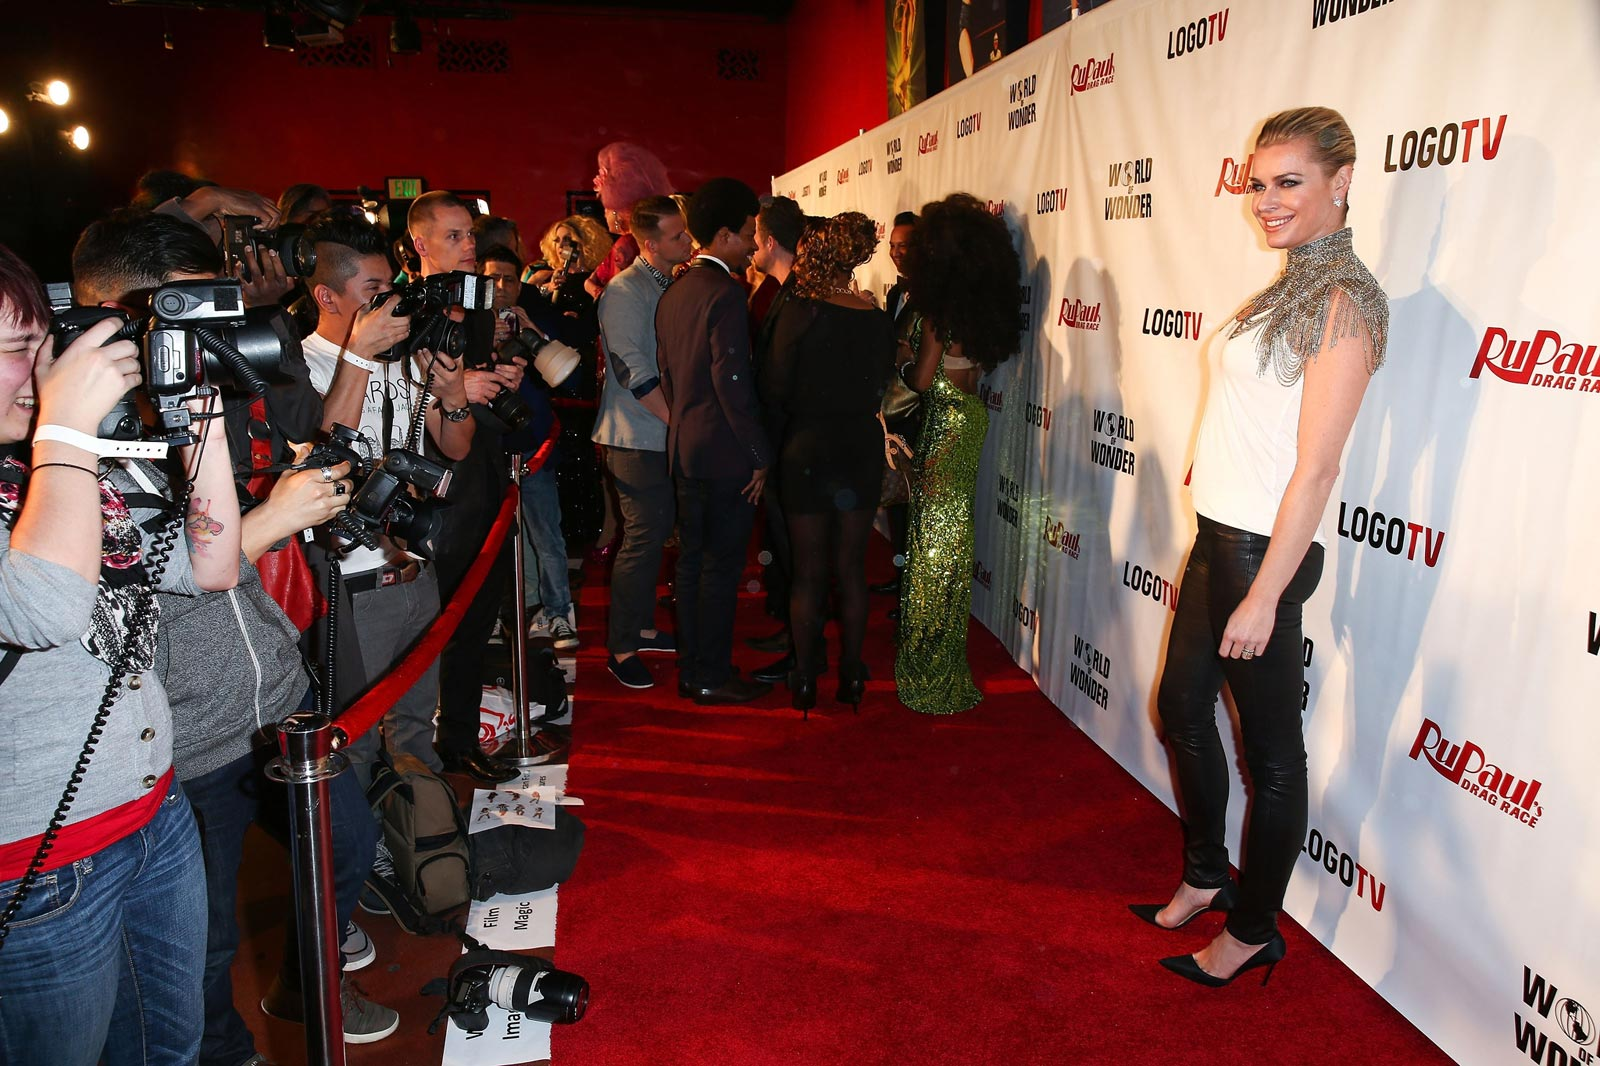 Rebecca Romijn attends the premiere of Logo TV RuPaul Drag Race